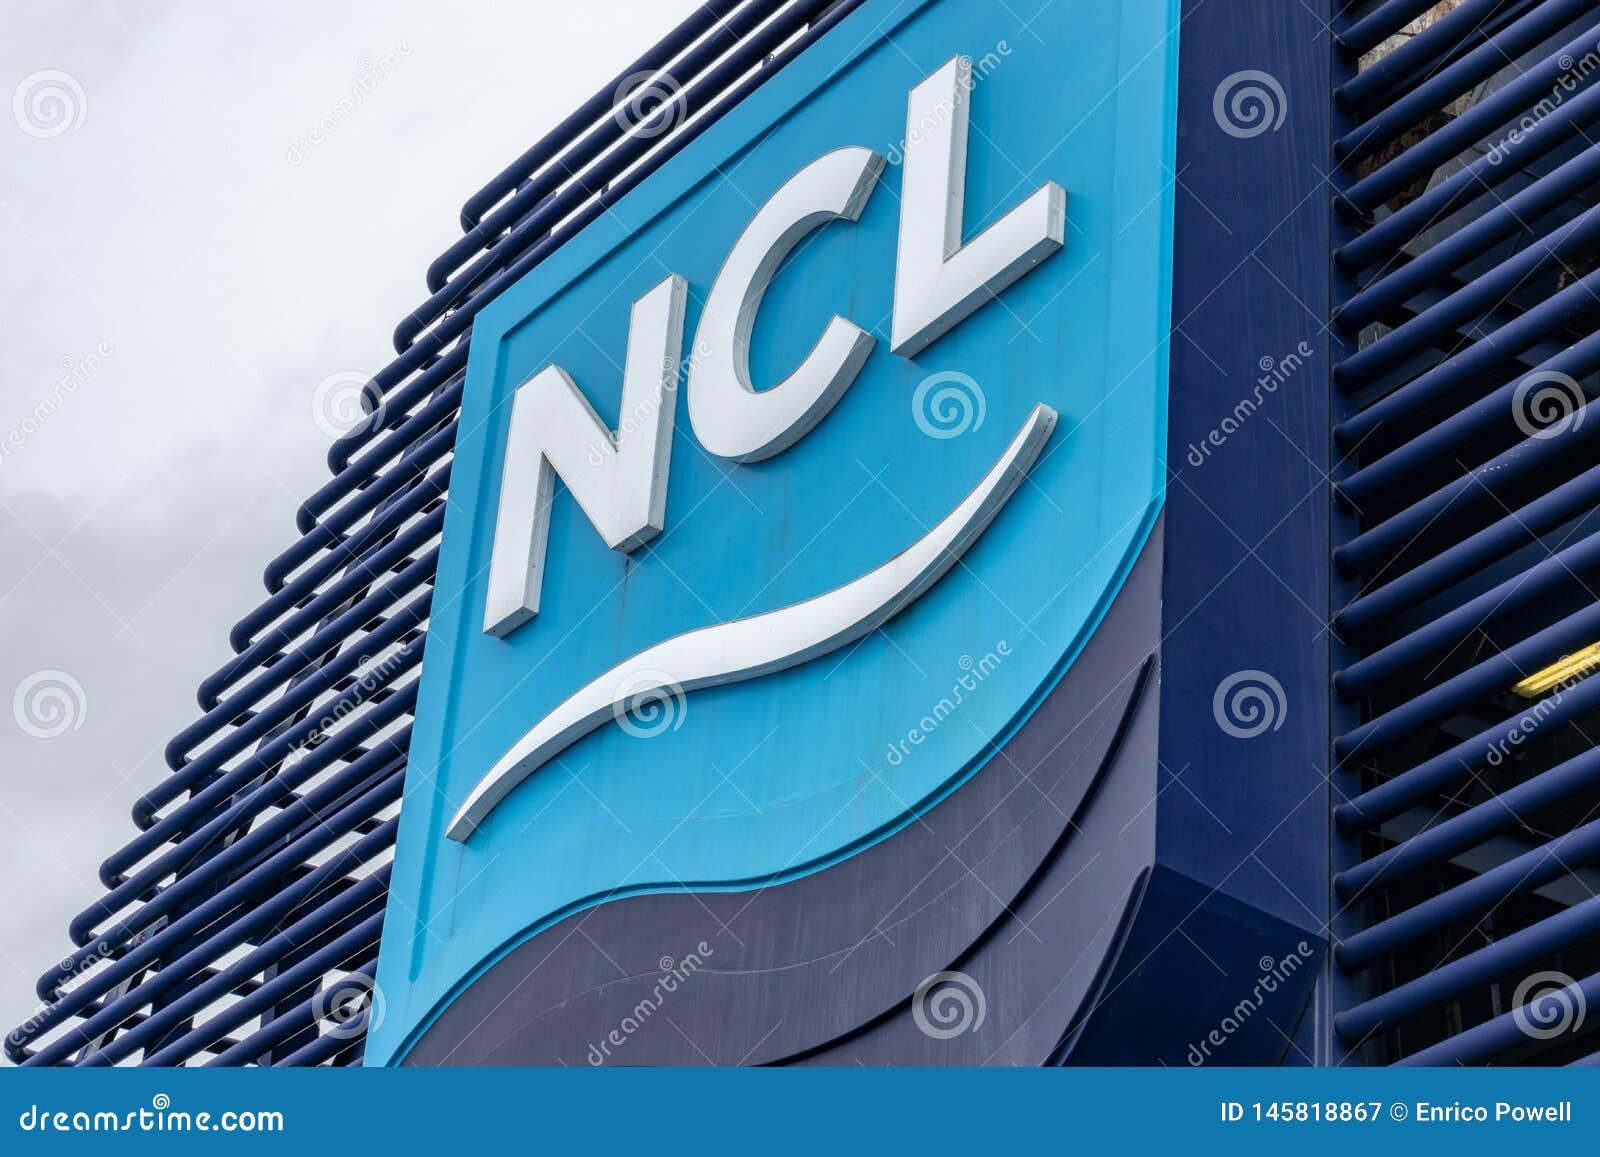 Norwegian Cruise Line NCL logo/sign/emblem on Norwegian Star Cruise Ship